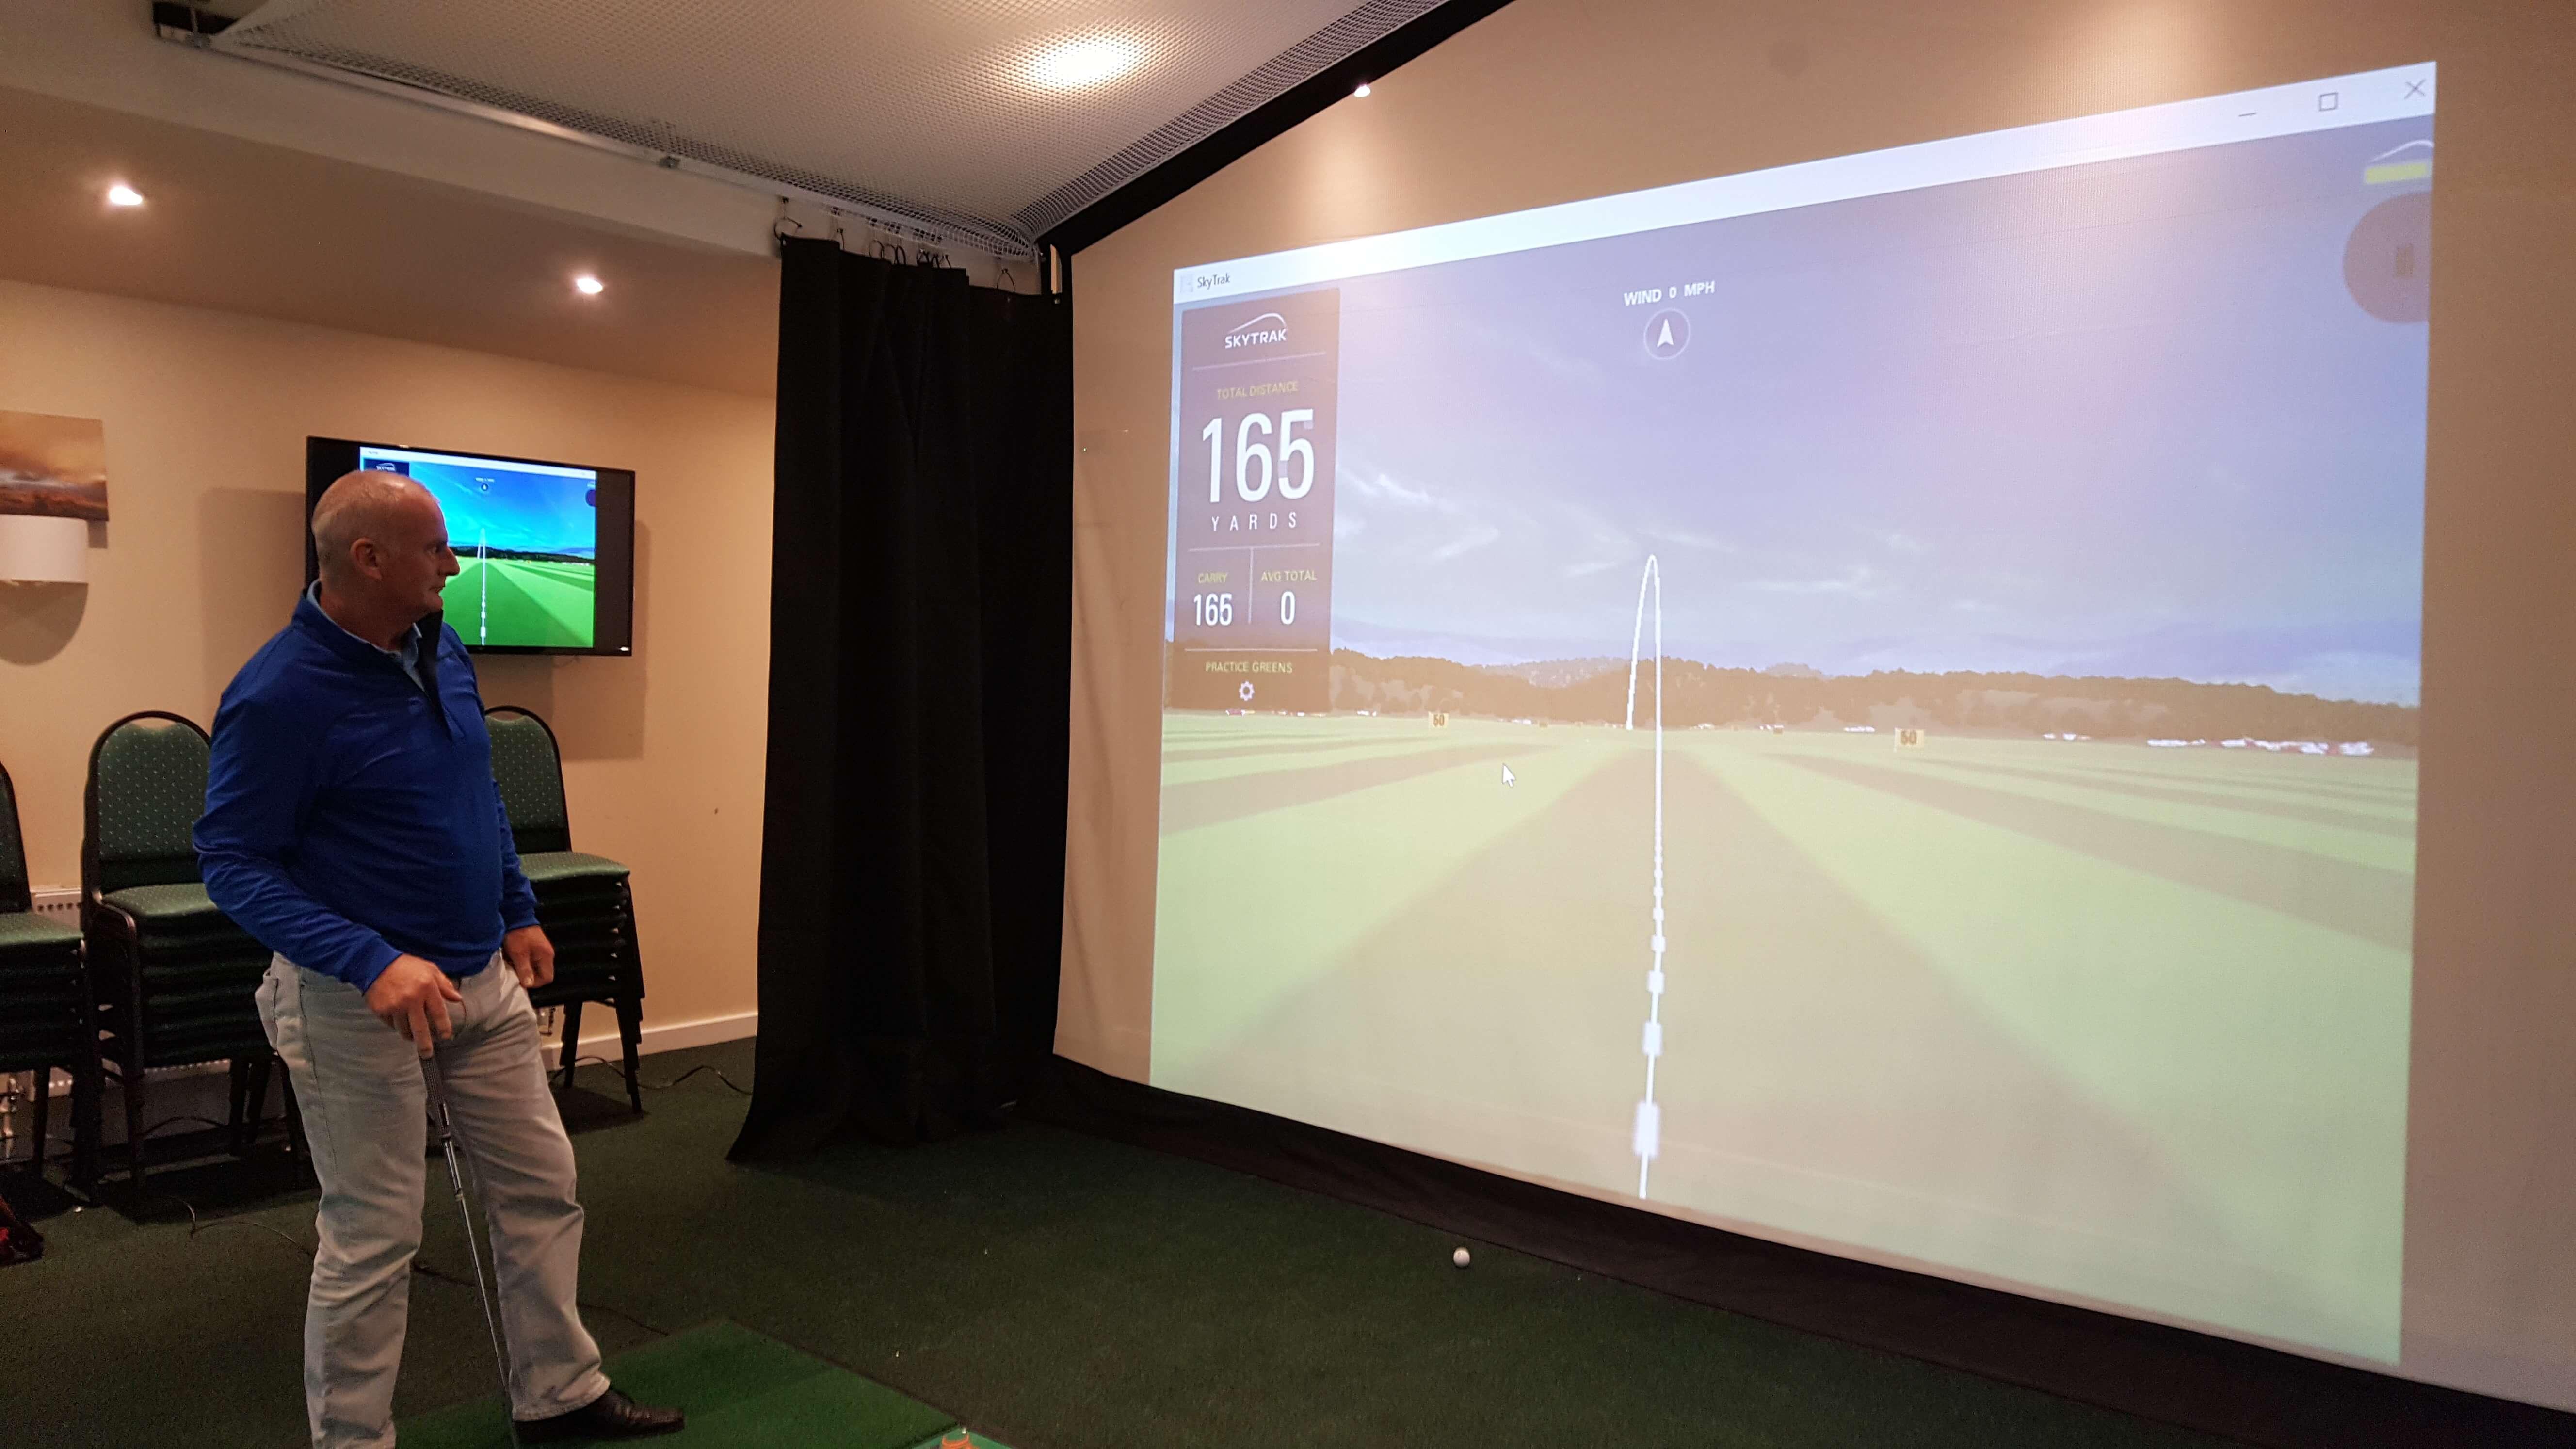 Par 2 Pro SQ HD Golf Simulator Screen Material and Archery Screen Material